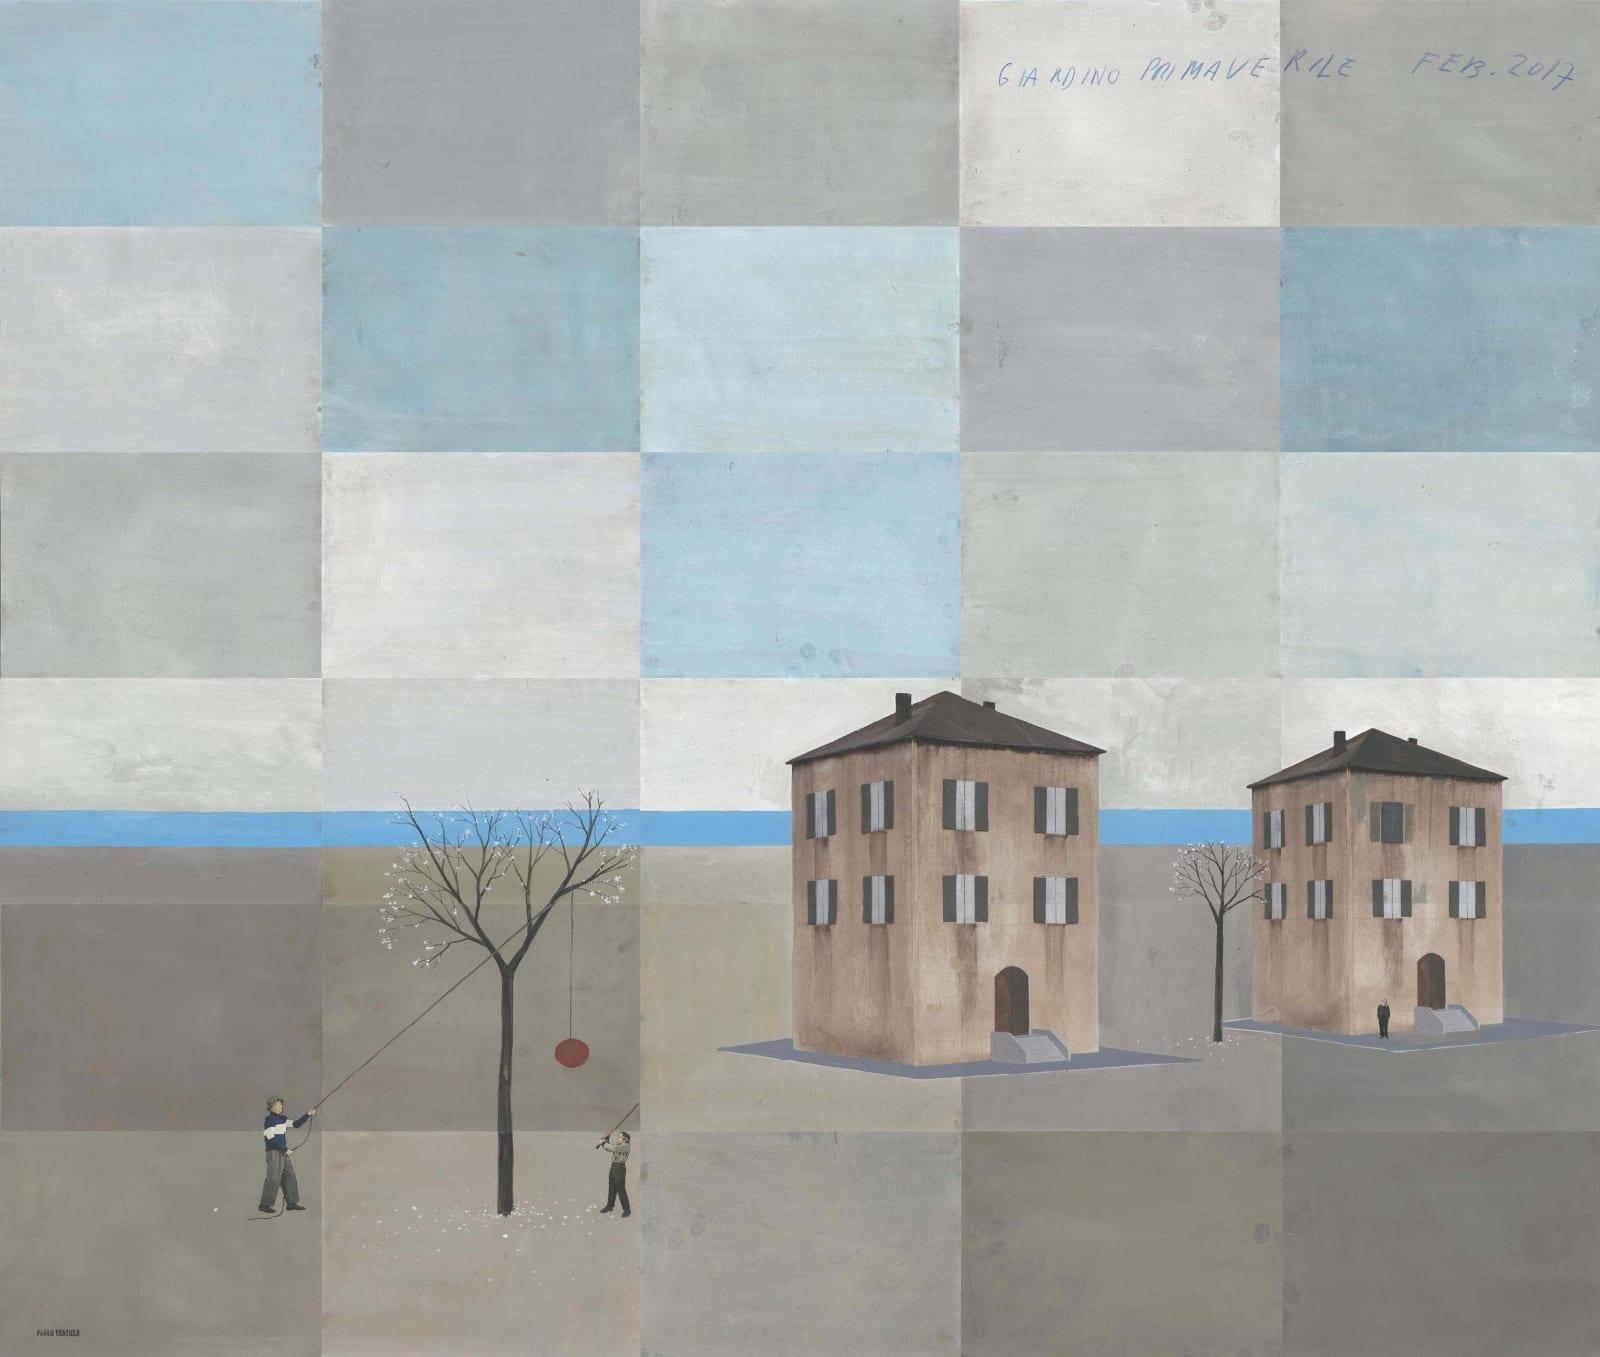 Paolo Ventura, Giardino Primaverile, 2017